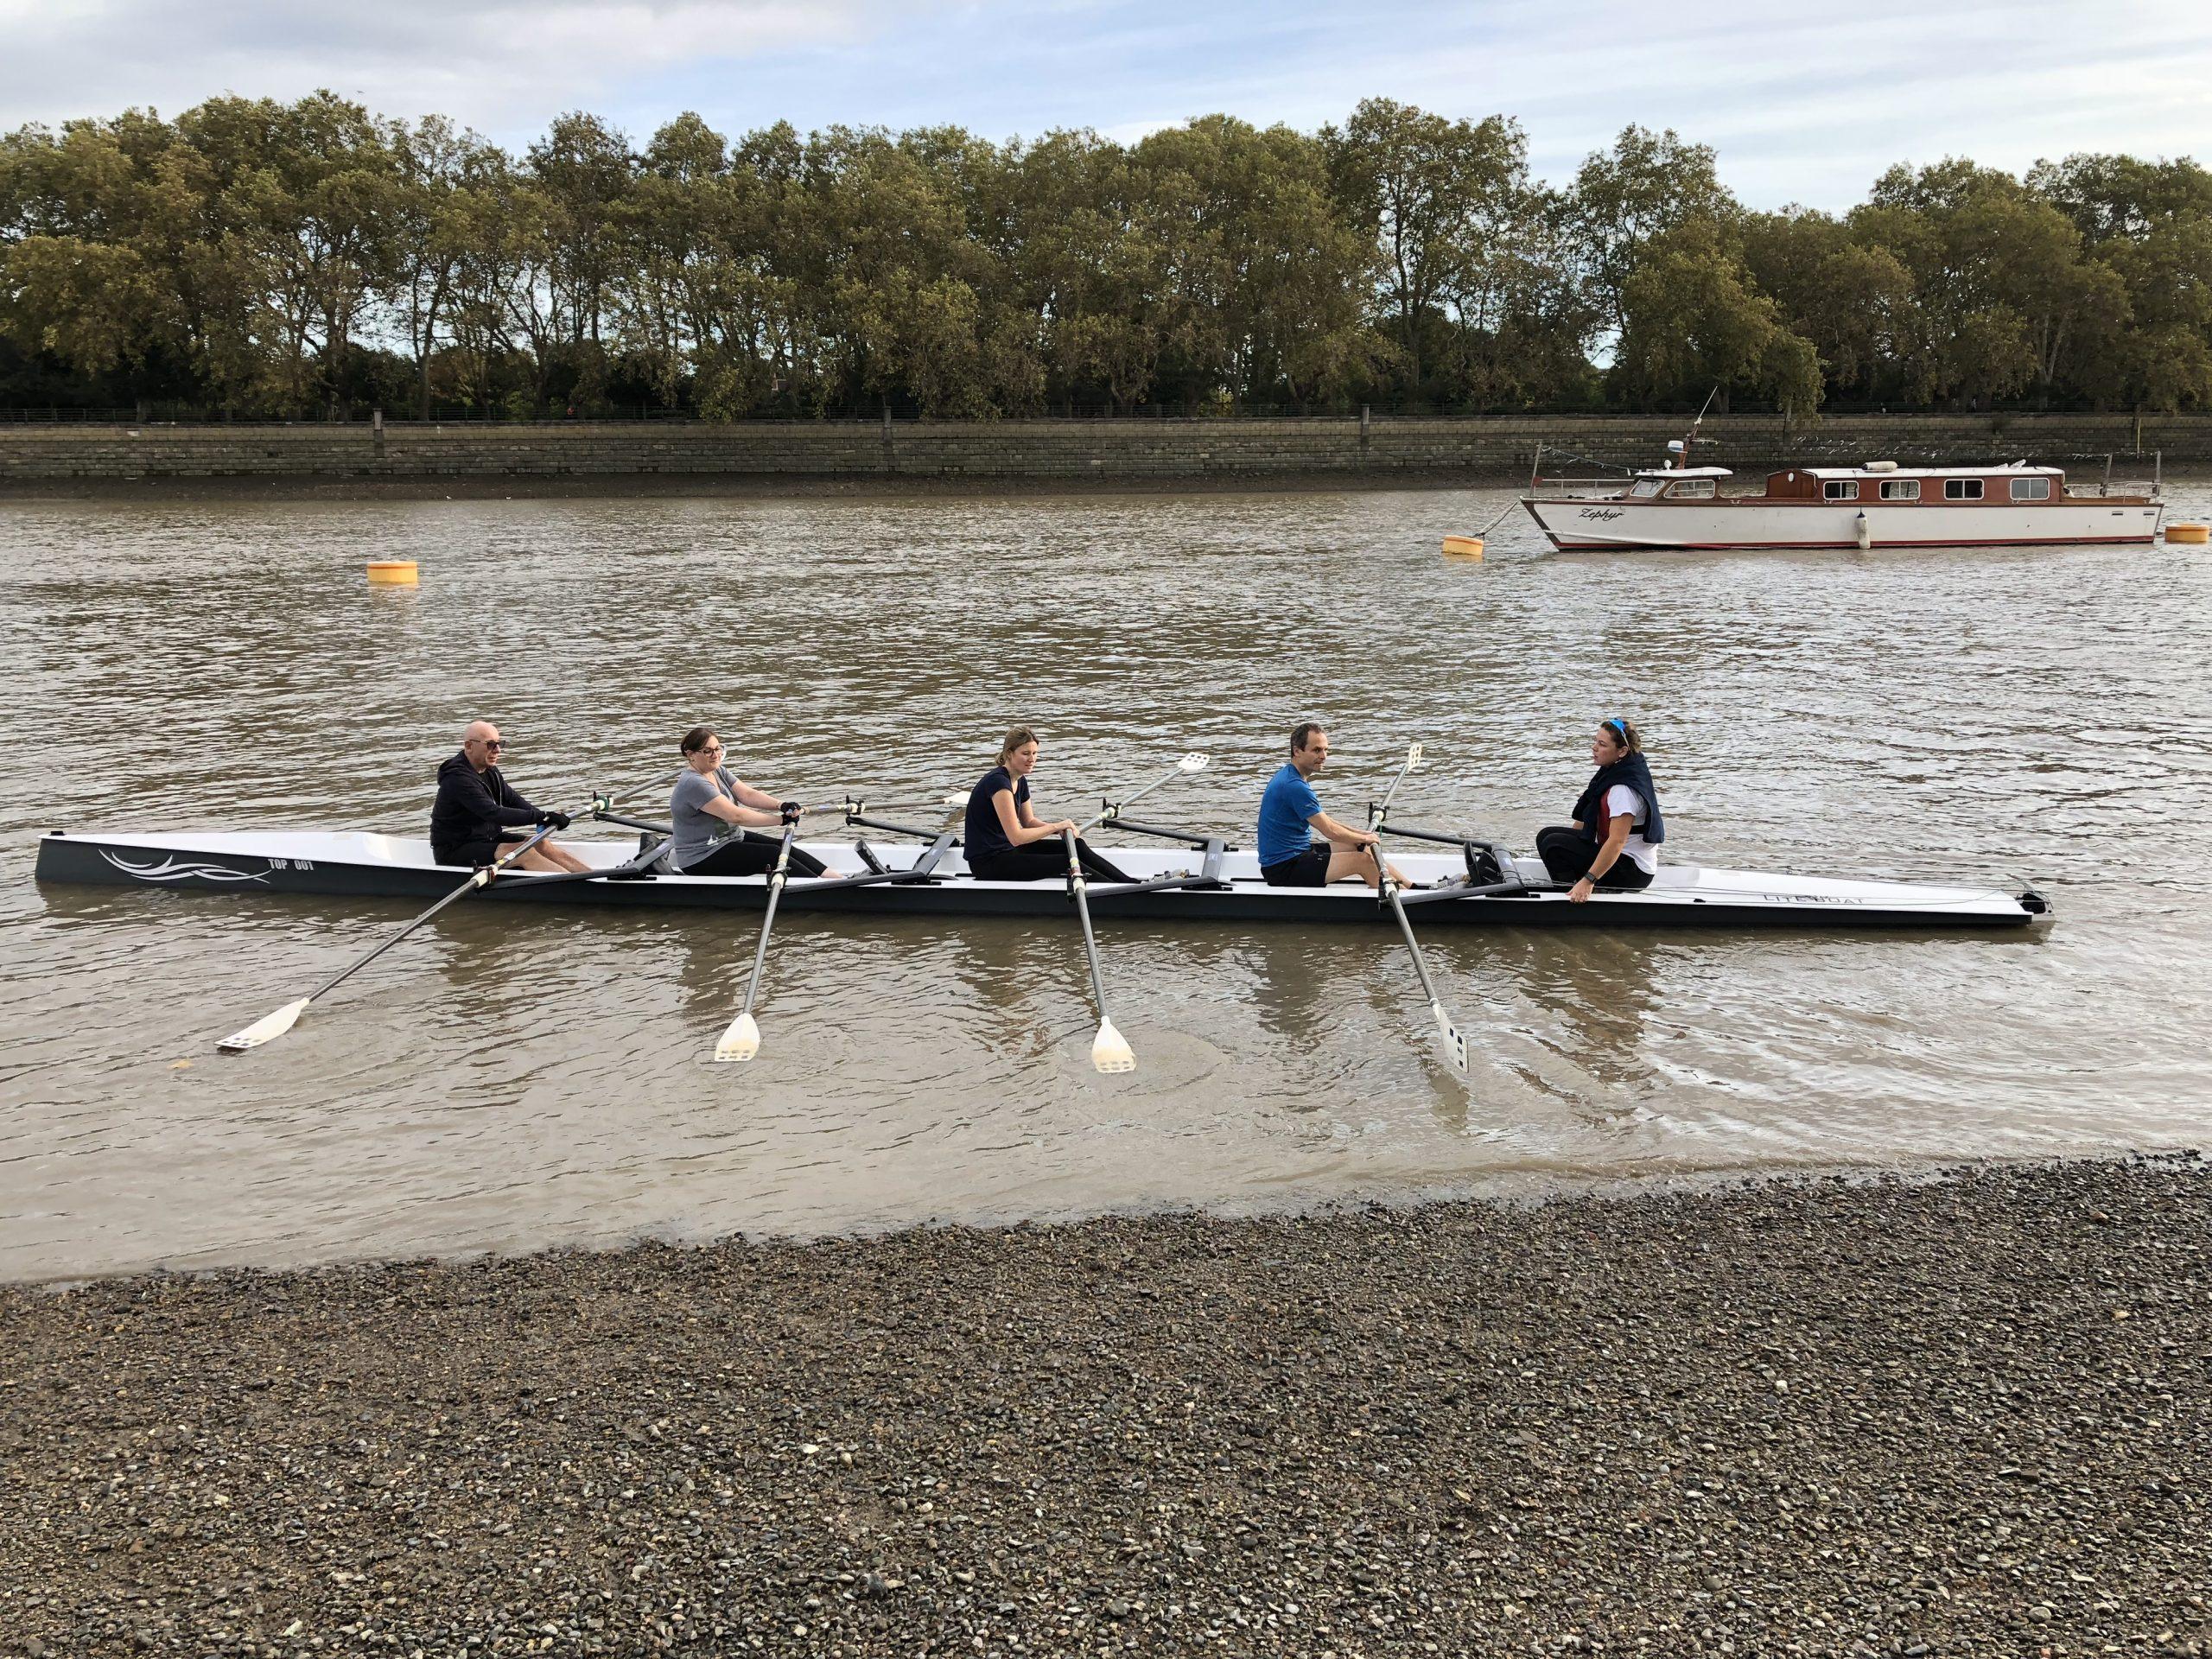 Row row row your boat in London!